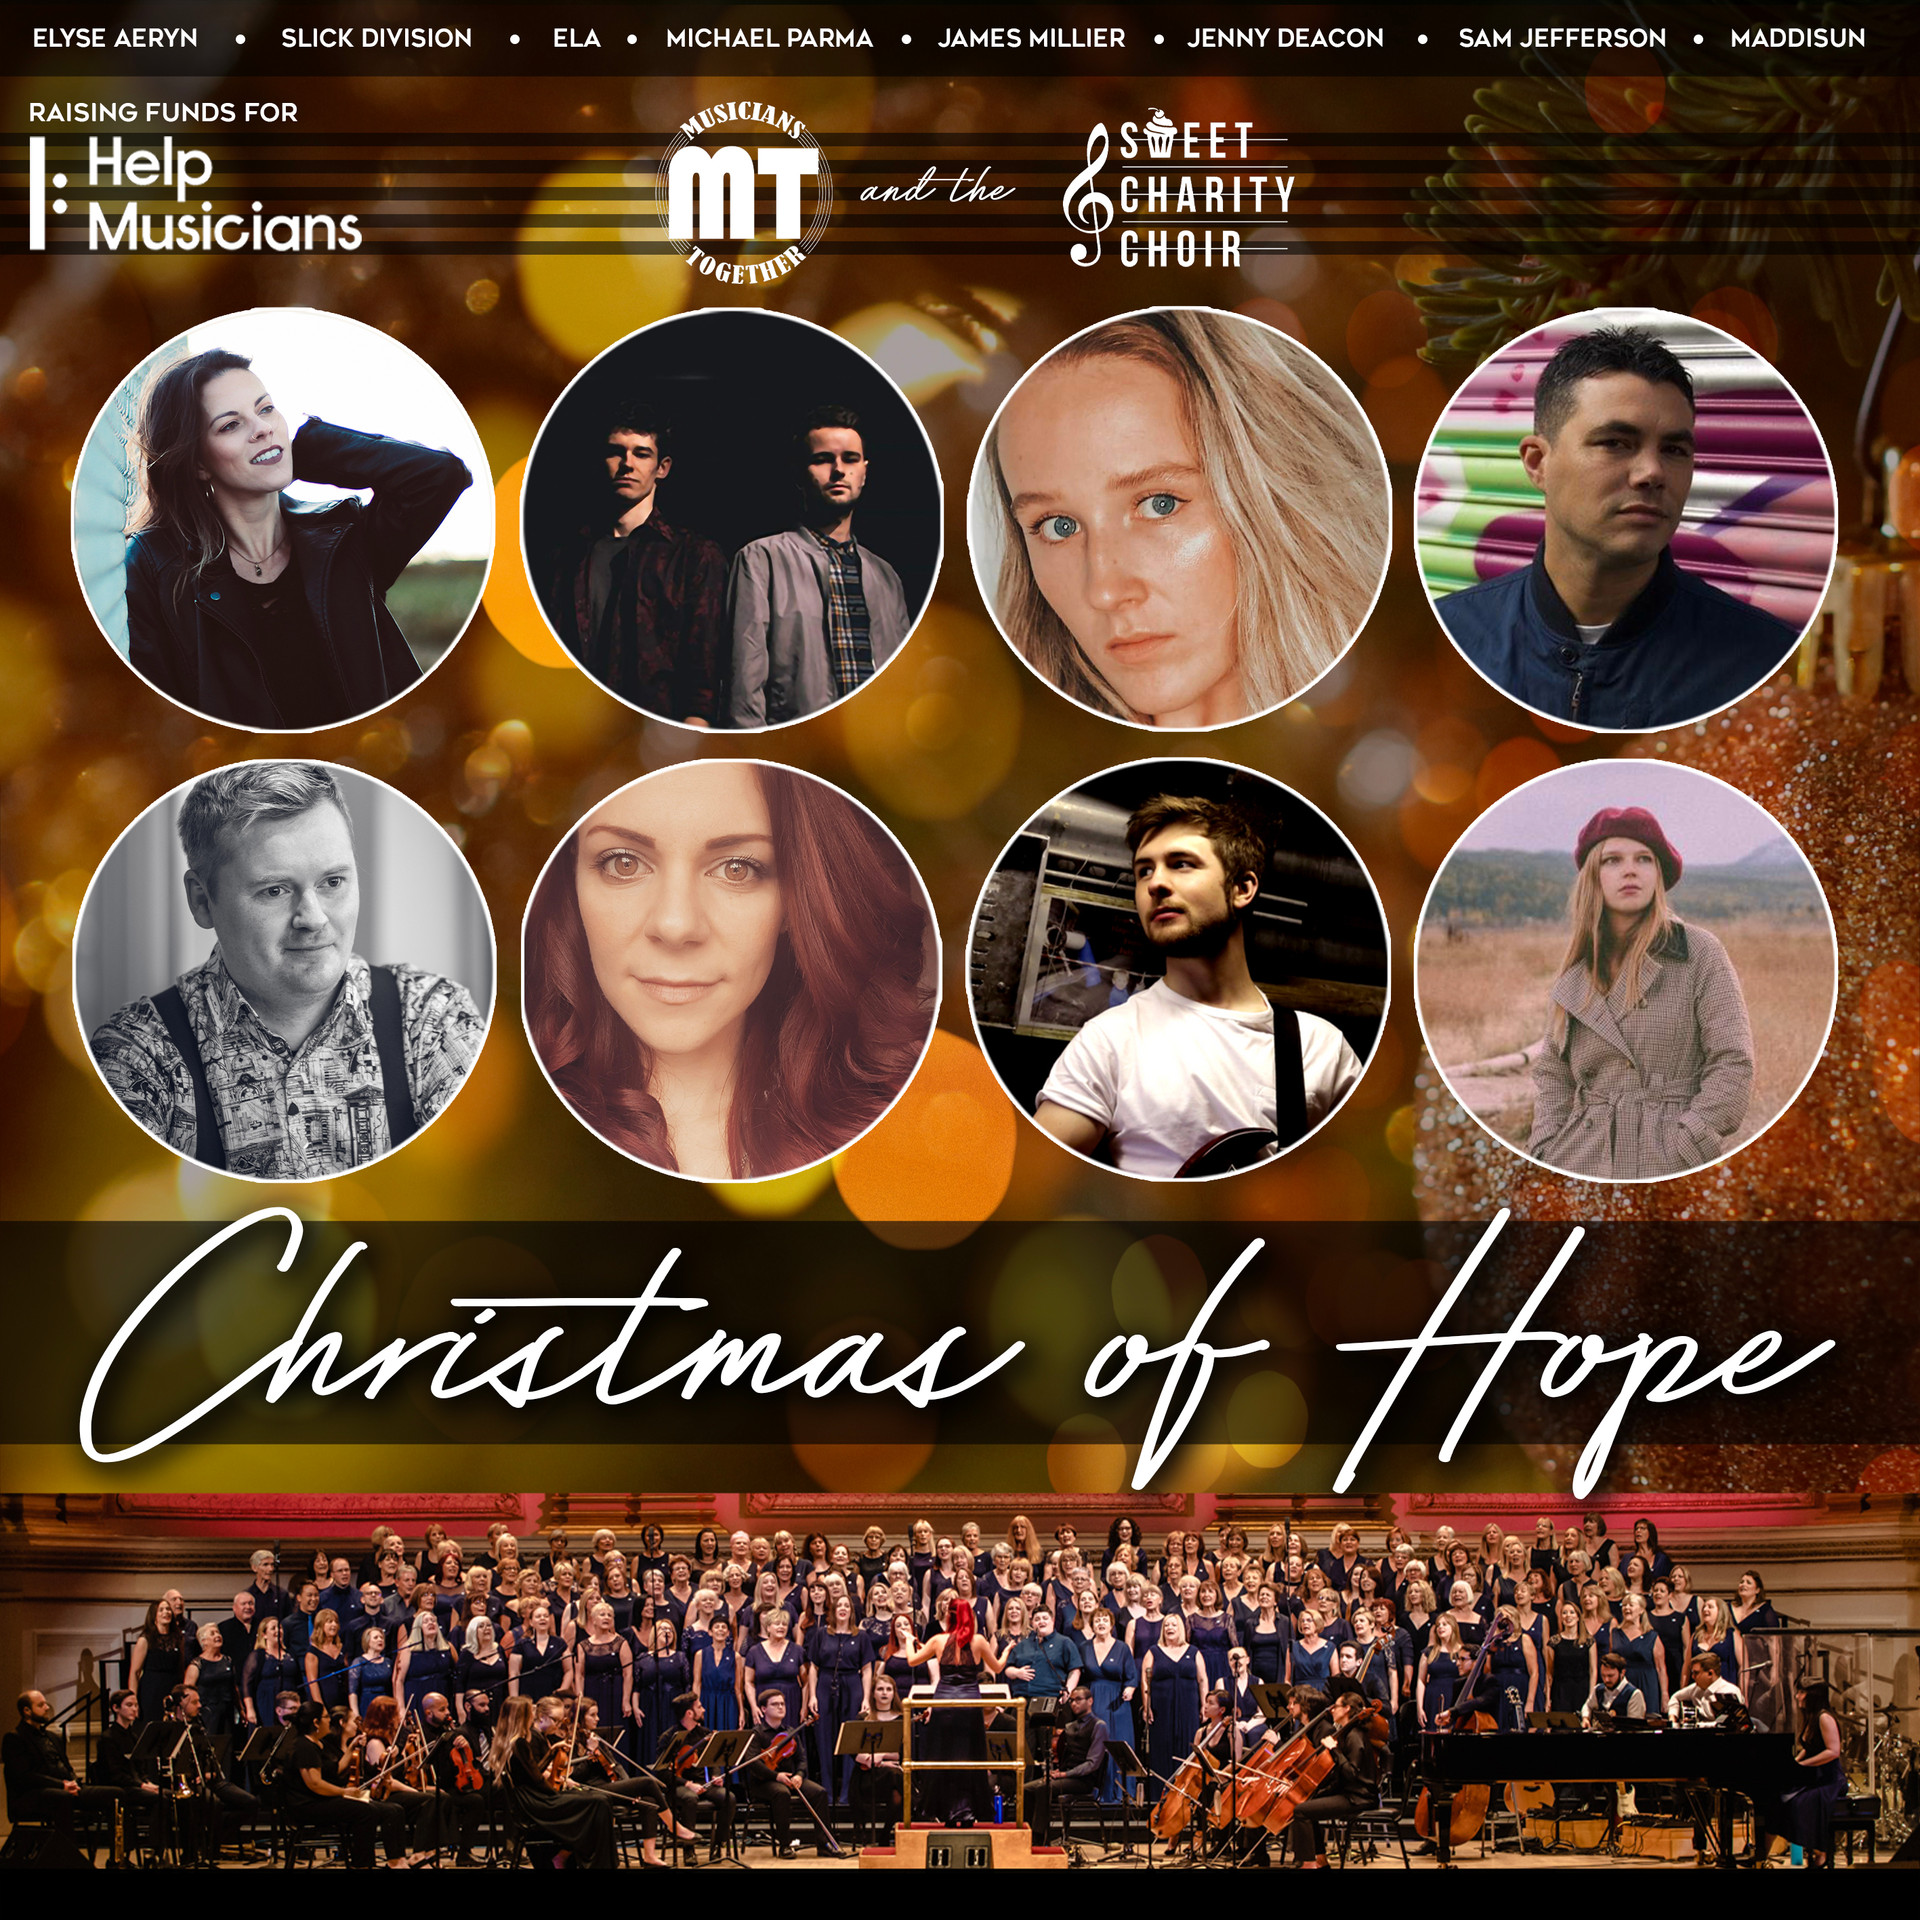 Christmas of Hope - Charity Christmas Single cover design 2020